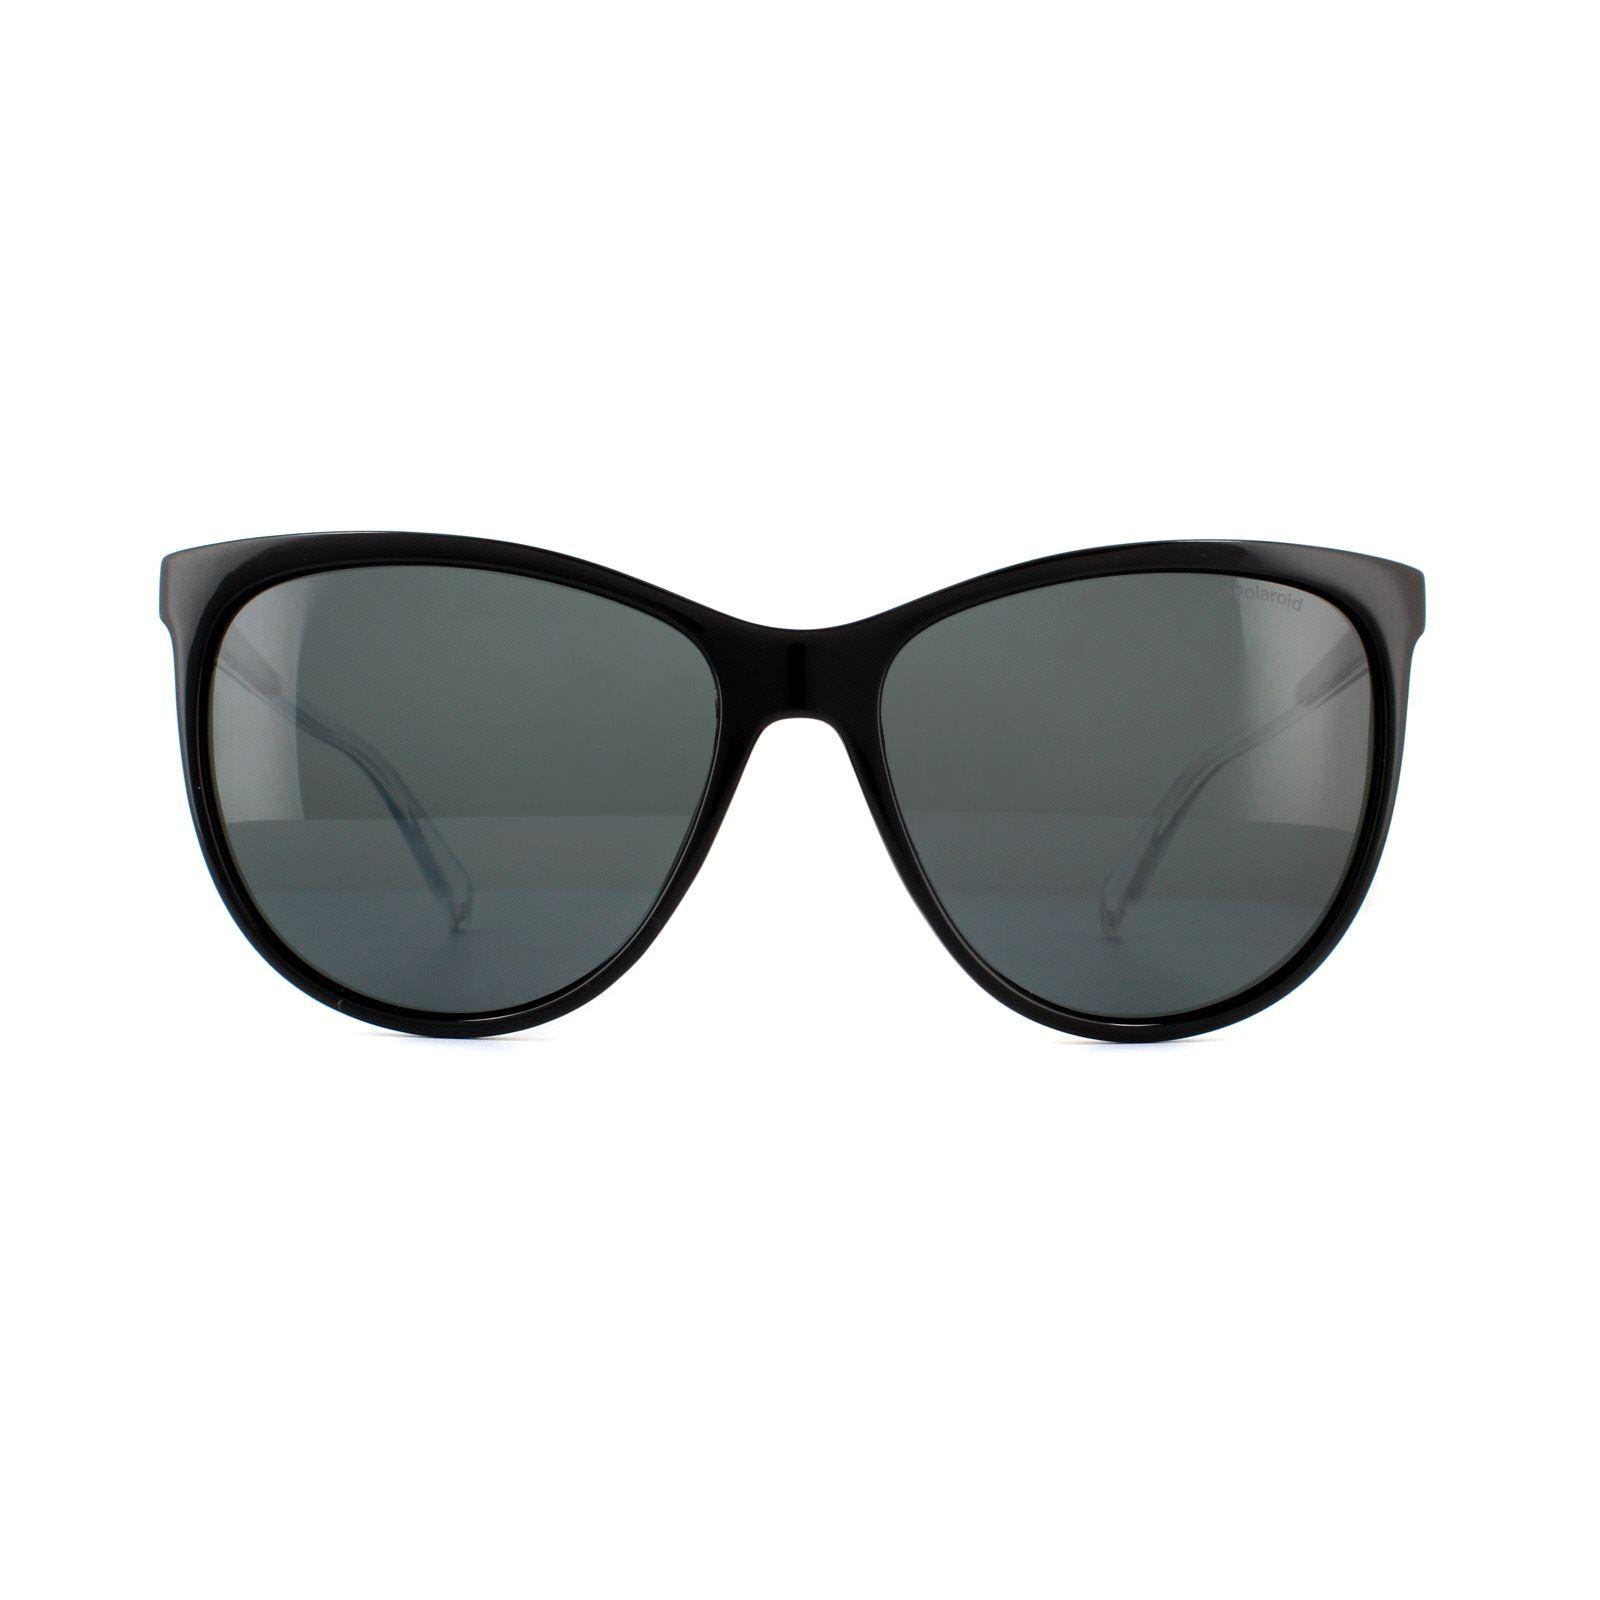 Polaroid Sunglasses PLD 4058/S 807 M9 Black Grey Polarized